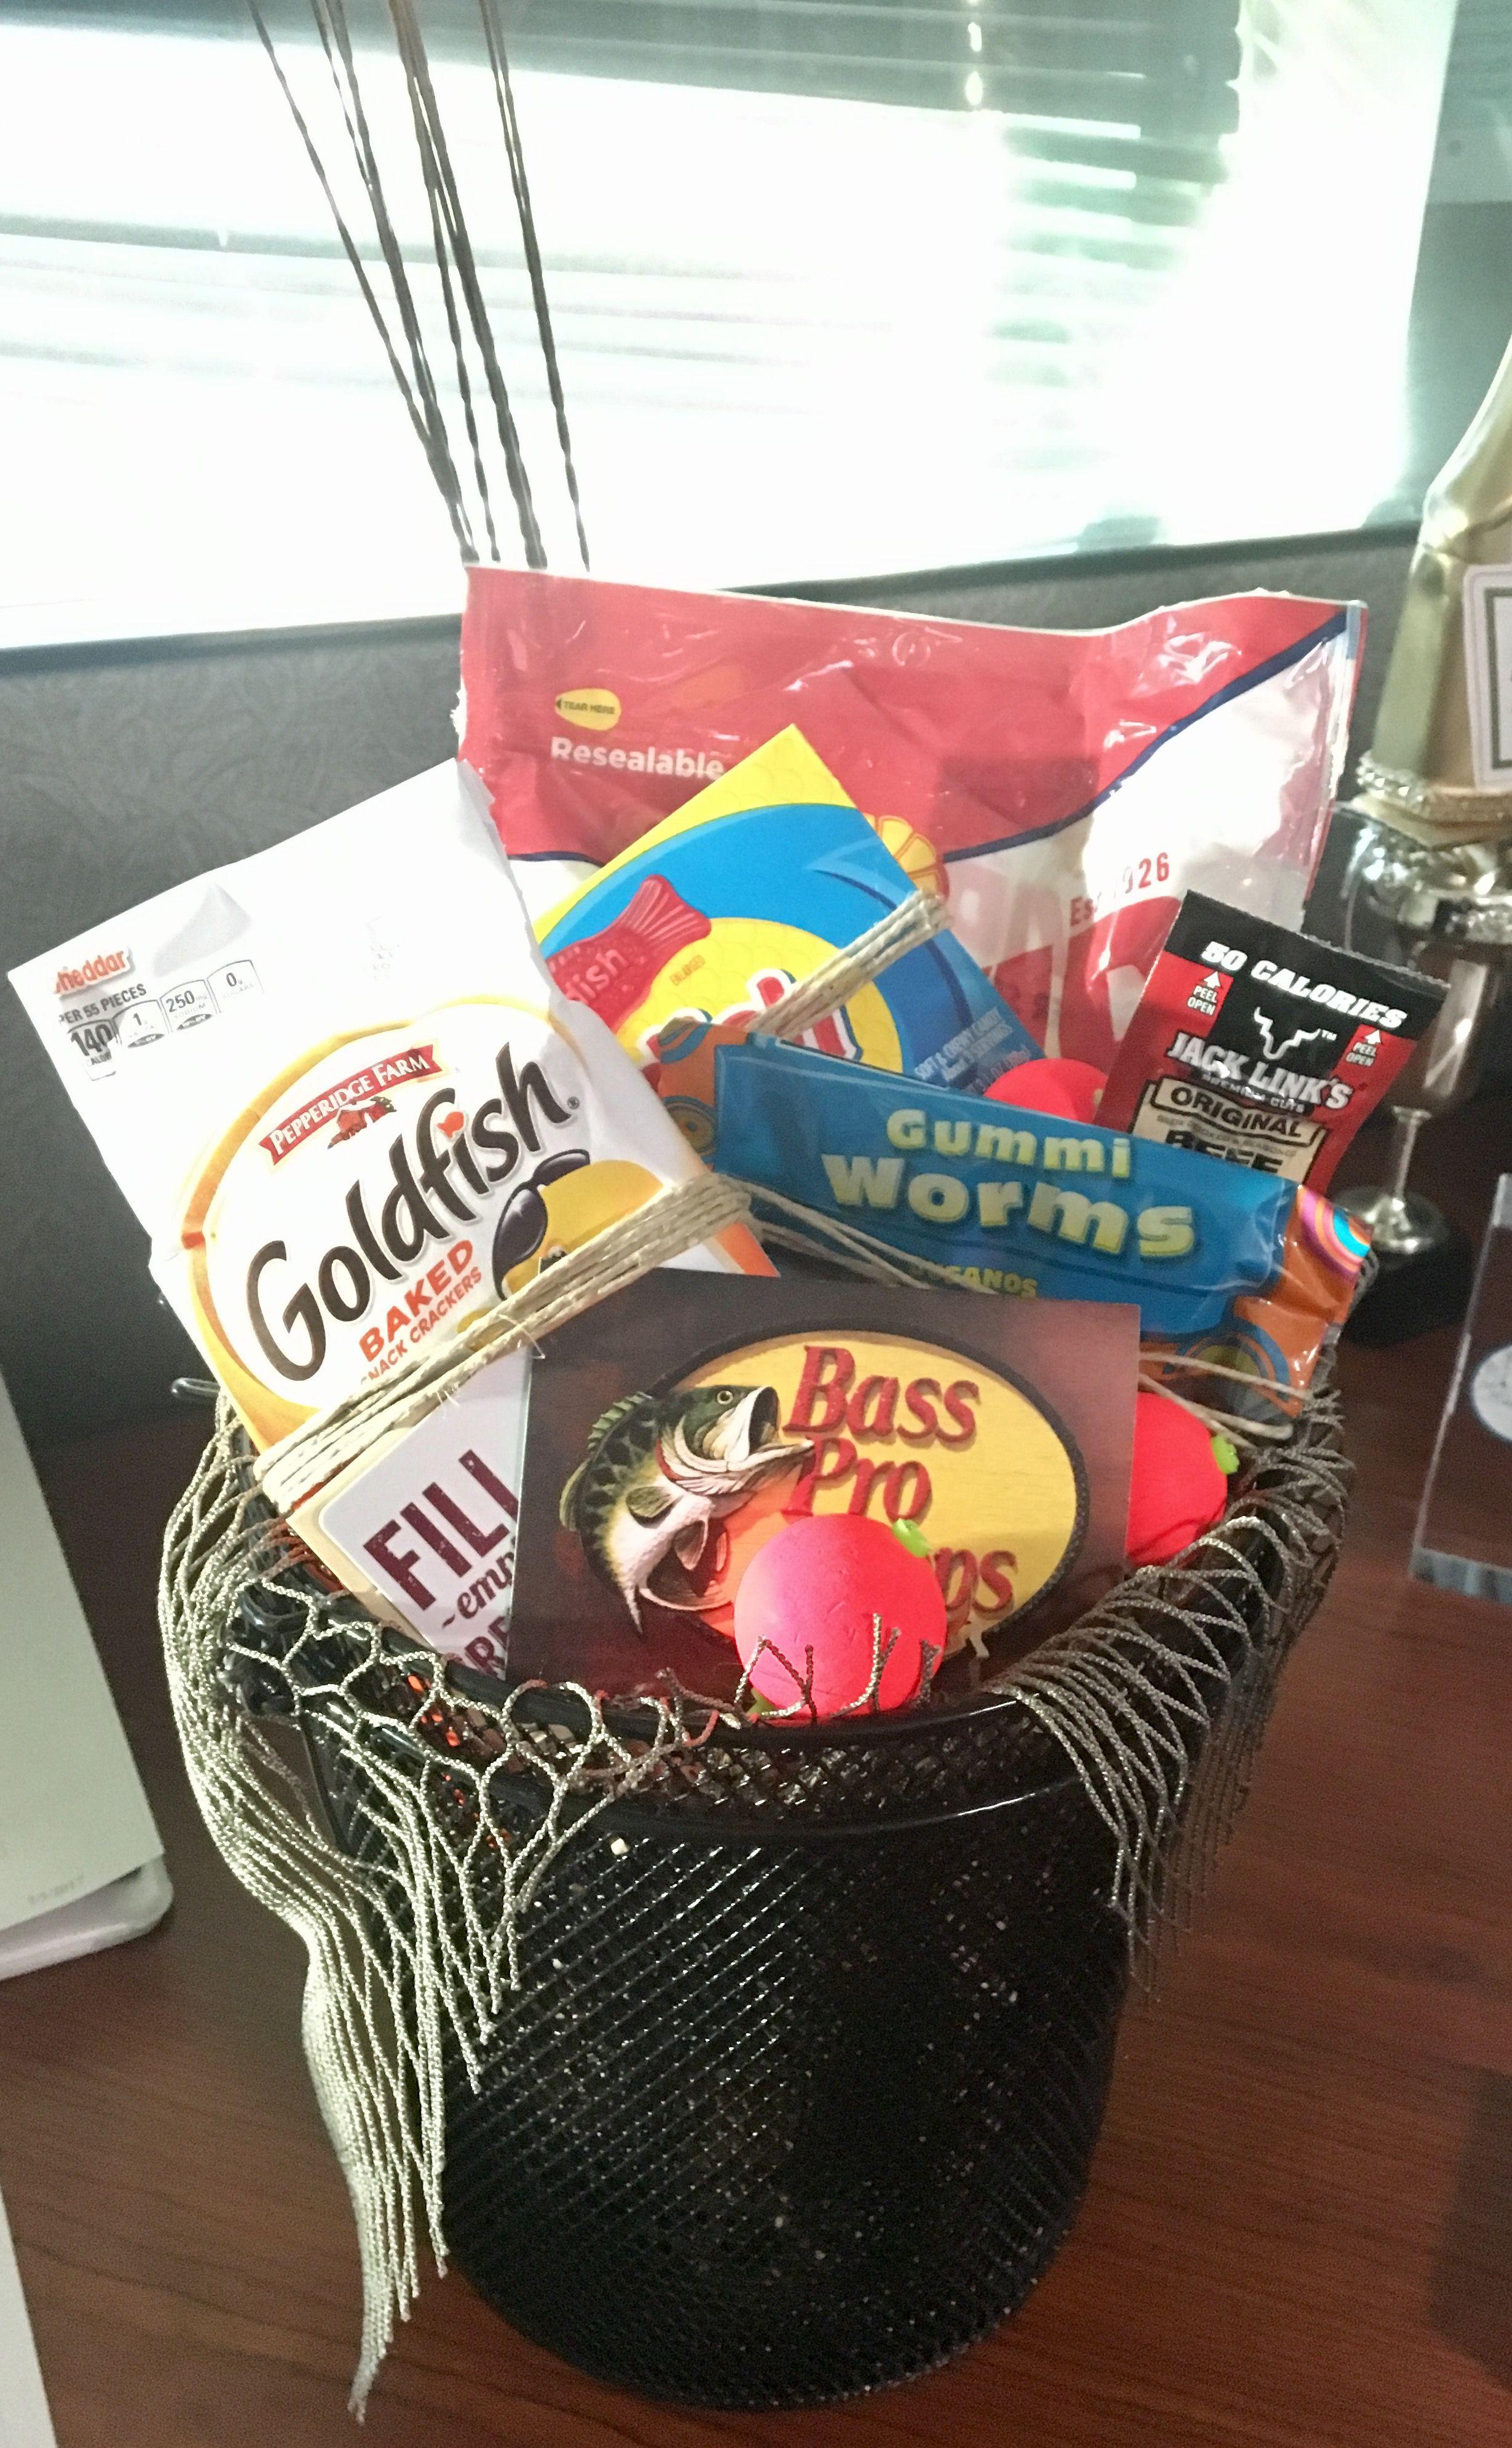 Boss's Day Gift: Reel good boss - Fishing themed gift basket #boyfriendgiftbasket